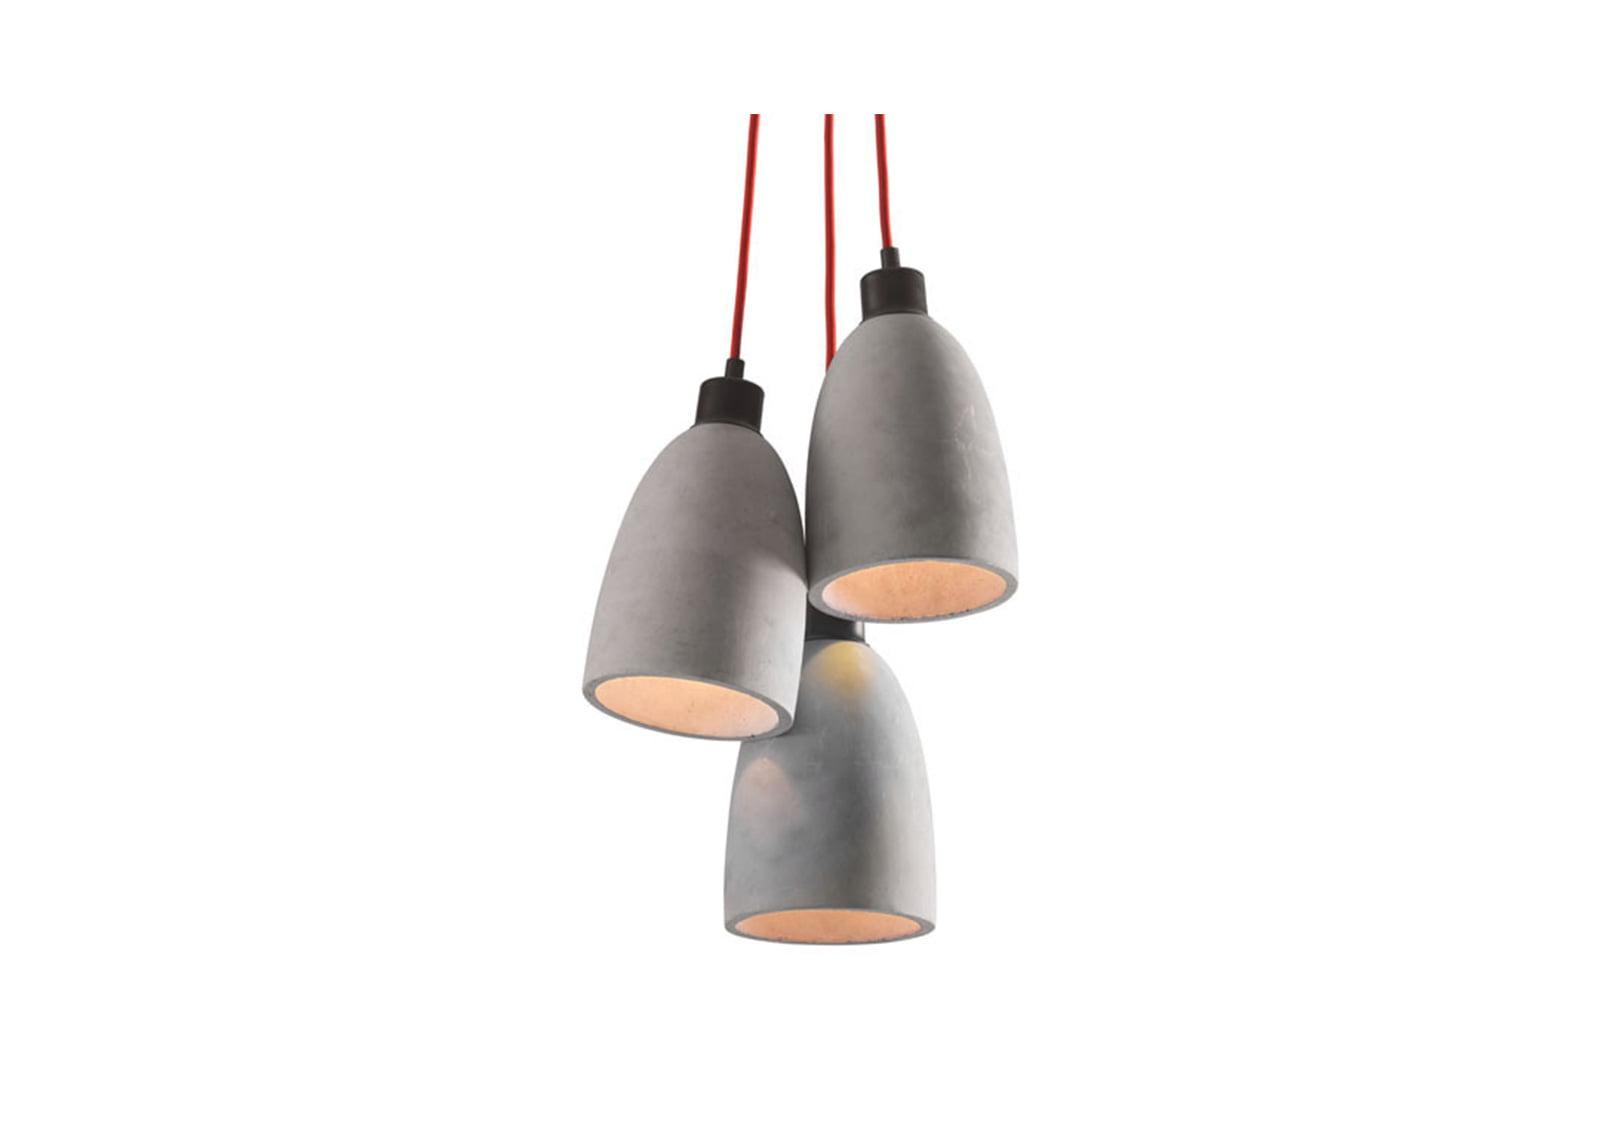 Fancy Ceiling Lamp Furnishplus